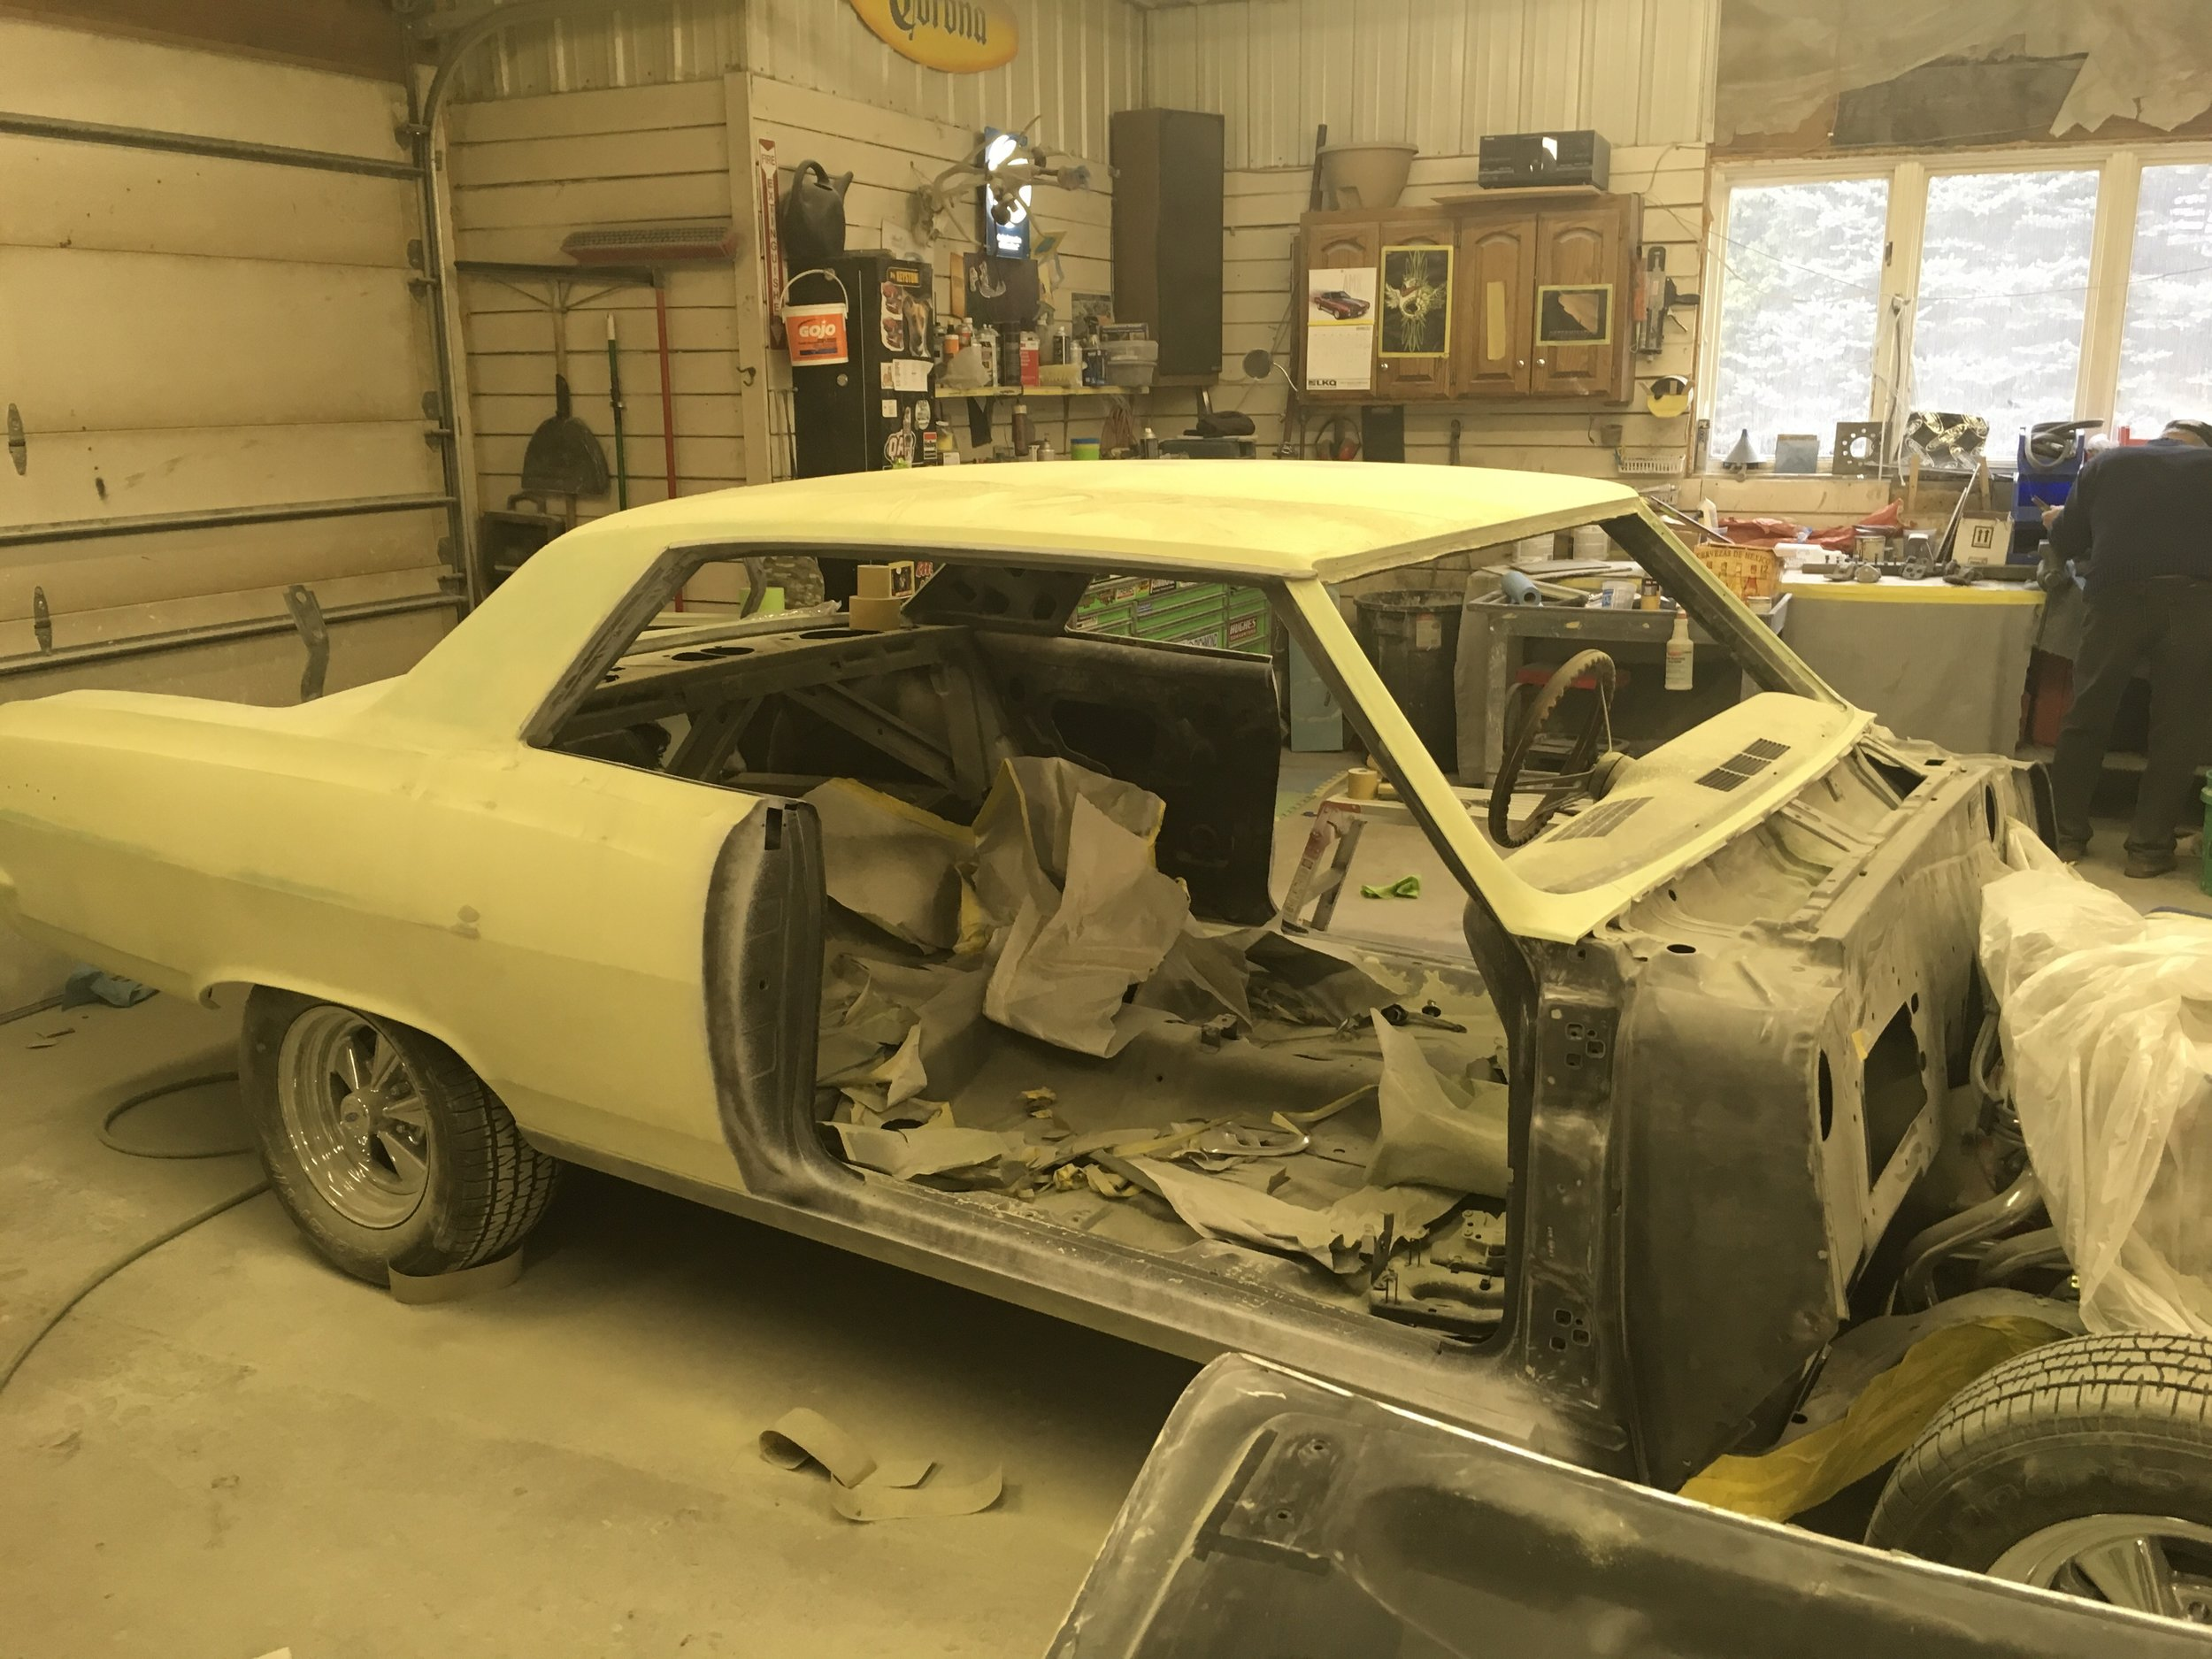 65-chevelle-body-work-and-painting-minneapolis-custom-hot-rod-car-restoration-hot-rod-factory.jpg